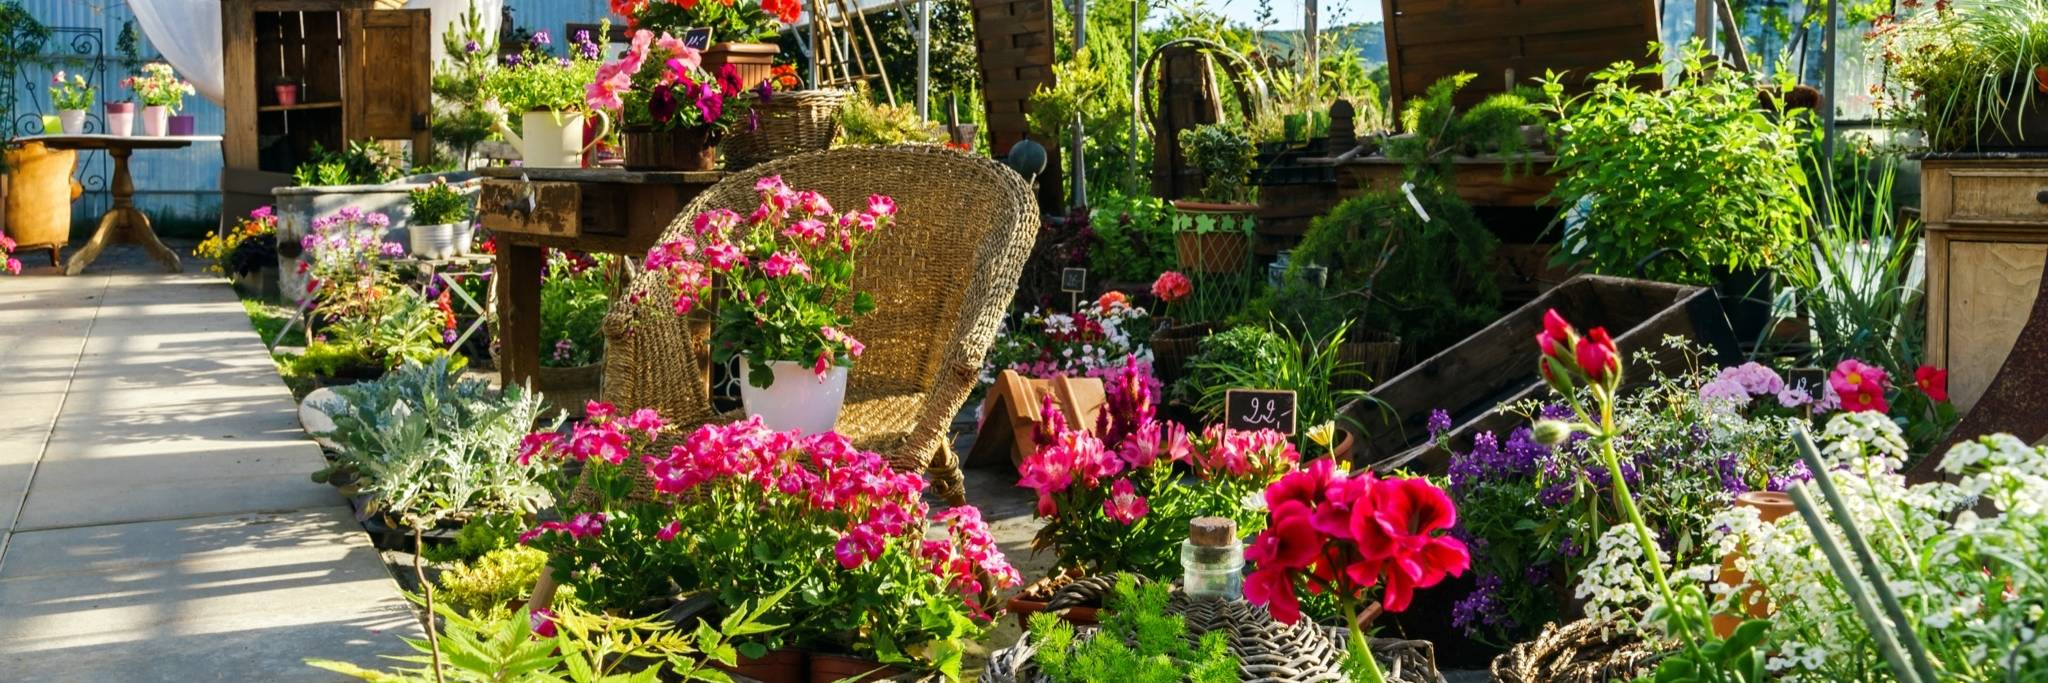 Zahradnické produkty, hnojivo, mulčovací kůra, substráty, zemina